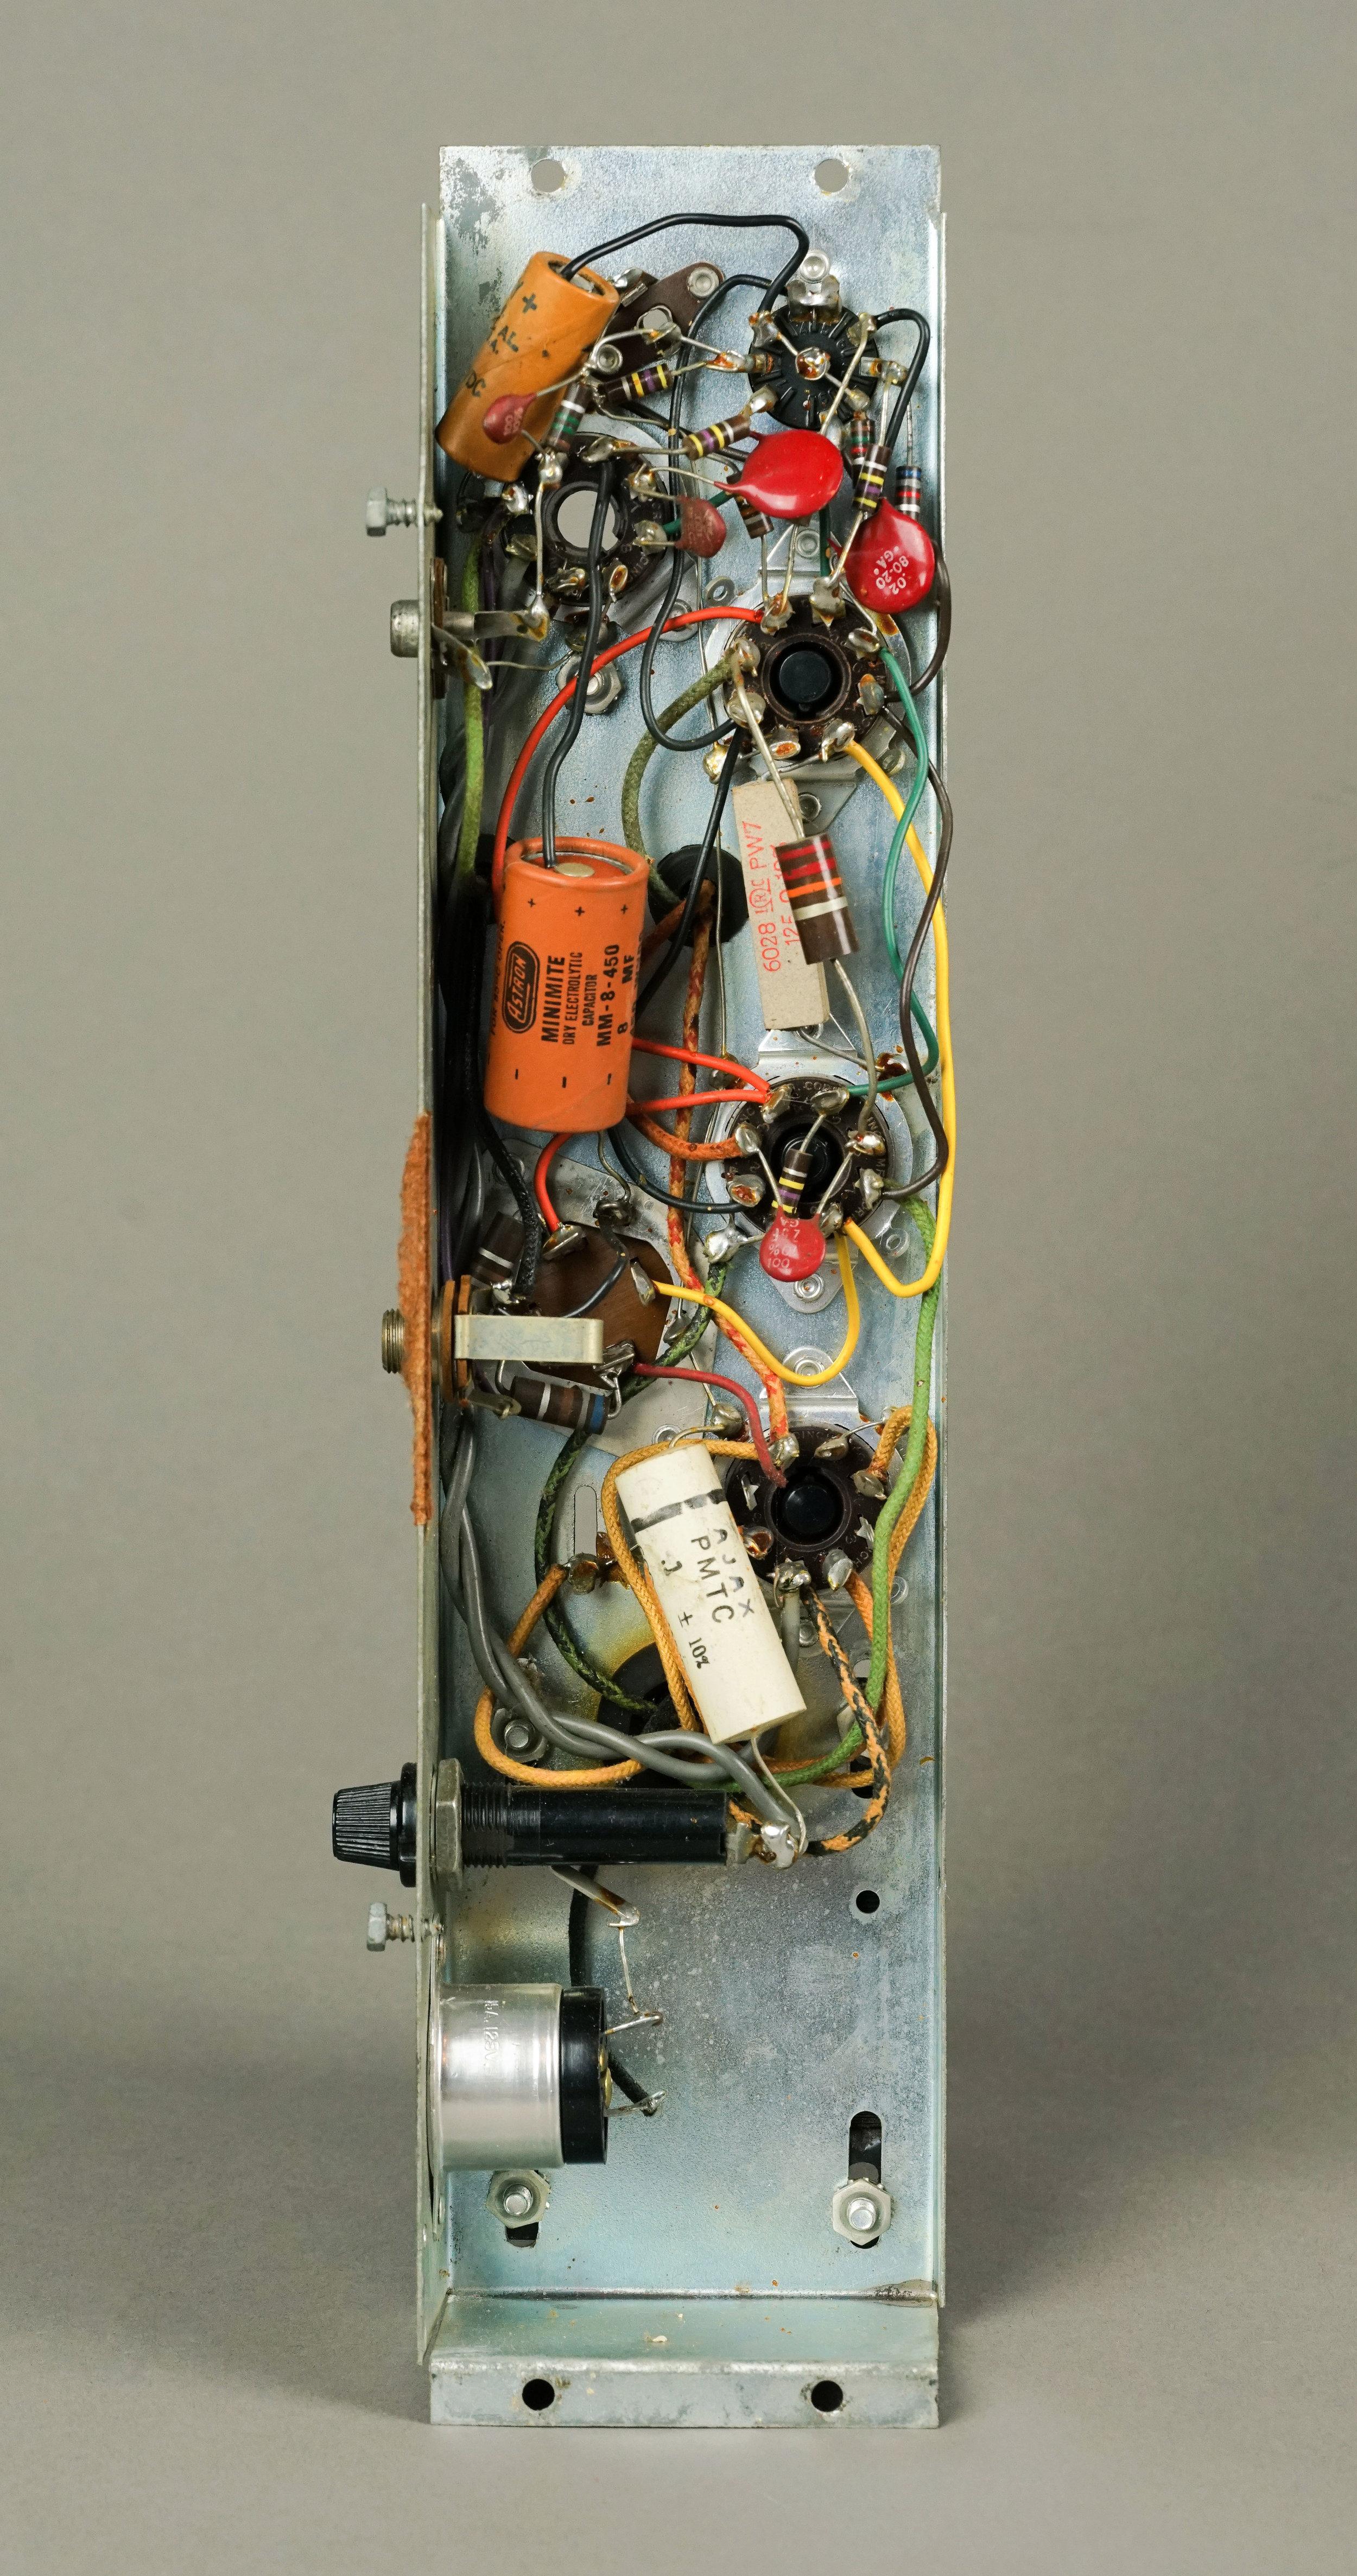 wurlitzer-120-700-amplifier.jpg